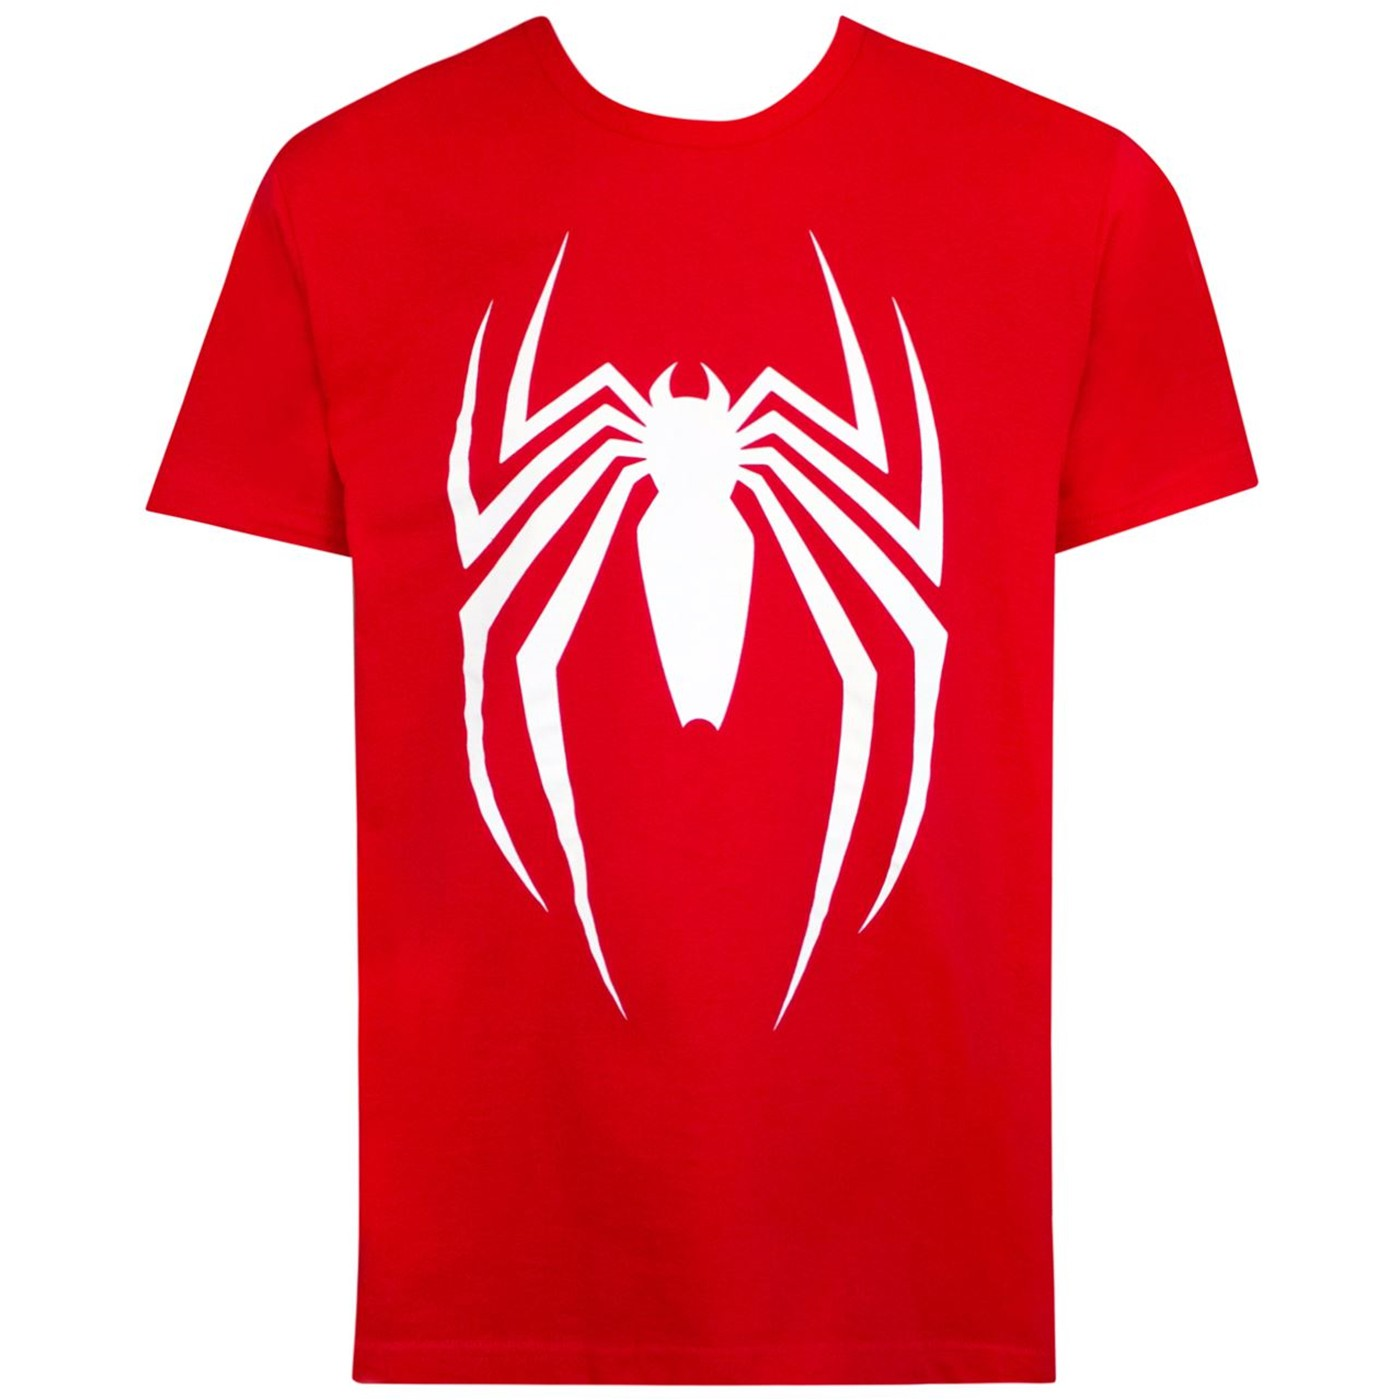 Spider-Man Video Game Logo Red Men's T-Shirt